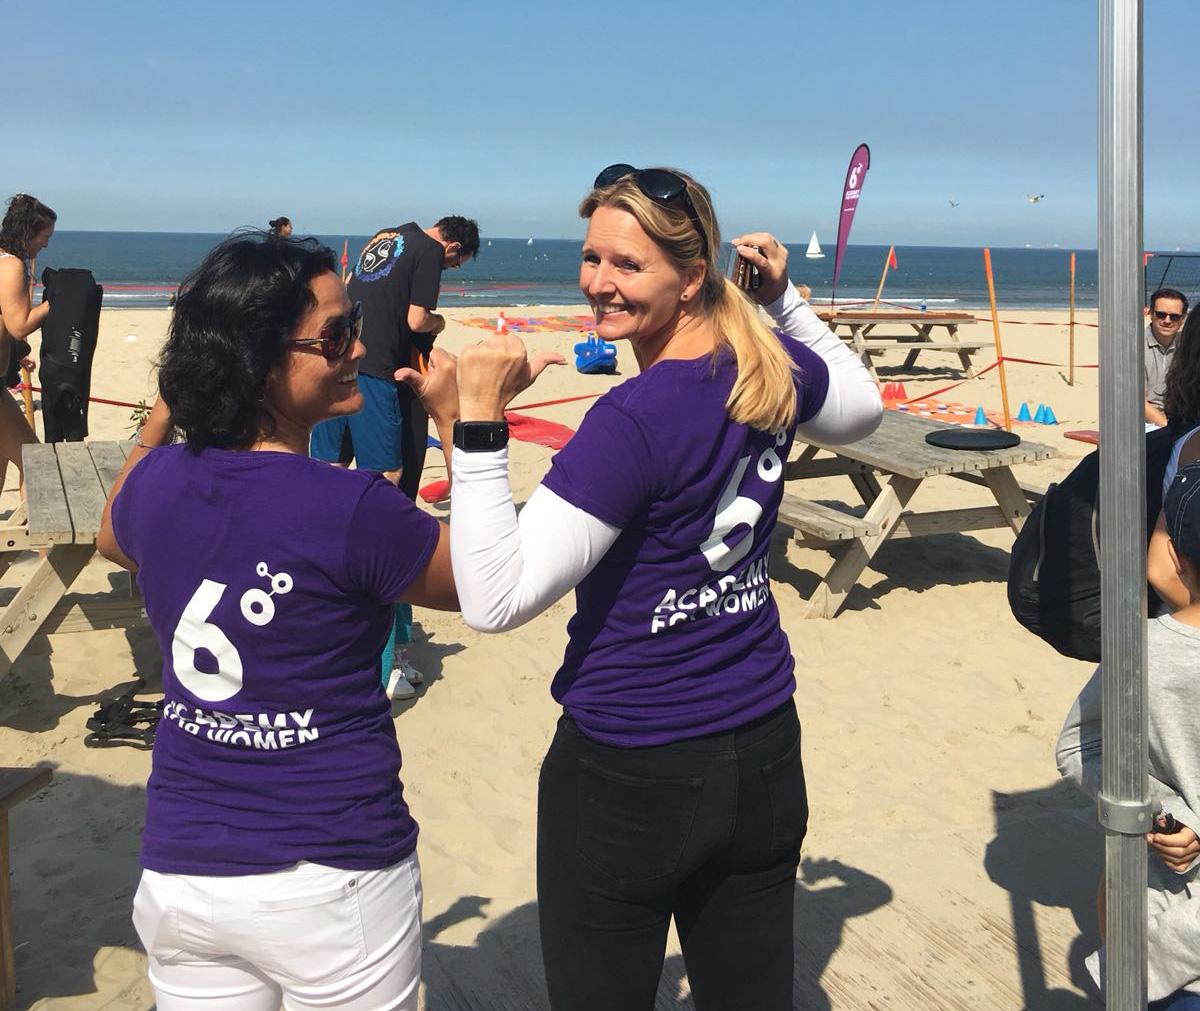 Founders Gita Pelinck and Debbie Middendorp promoting 6°